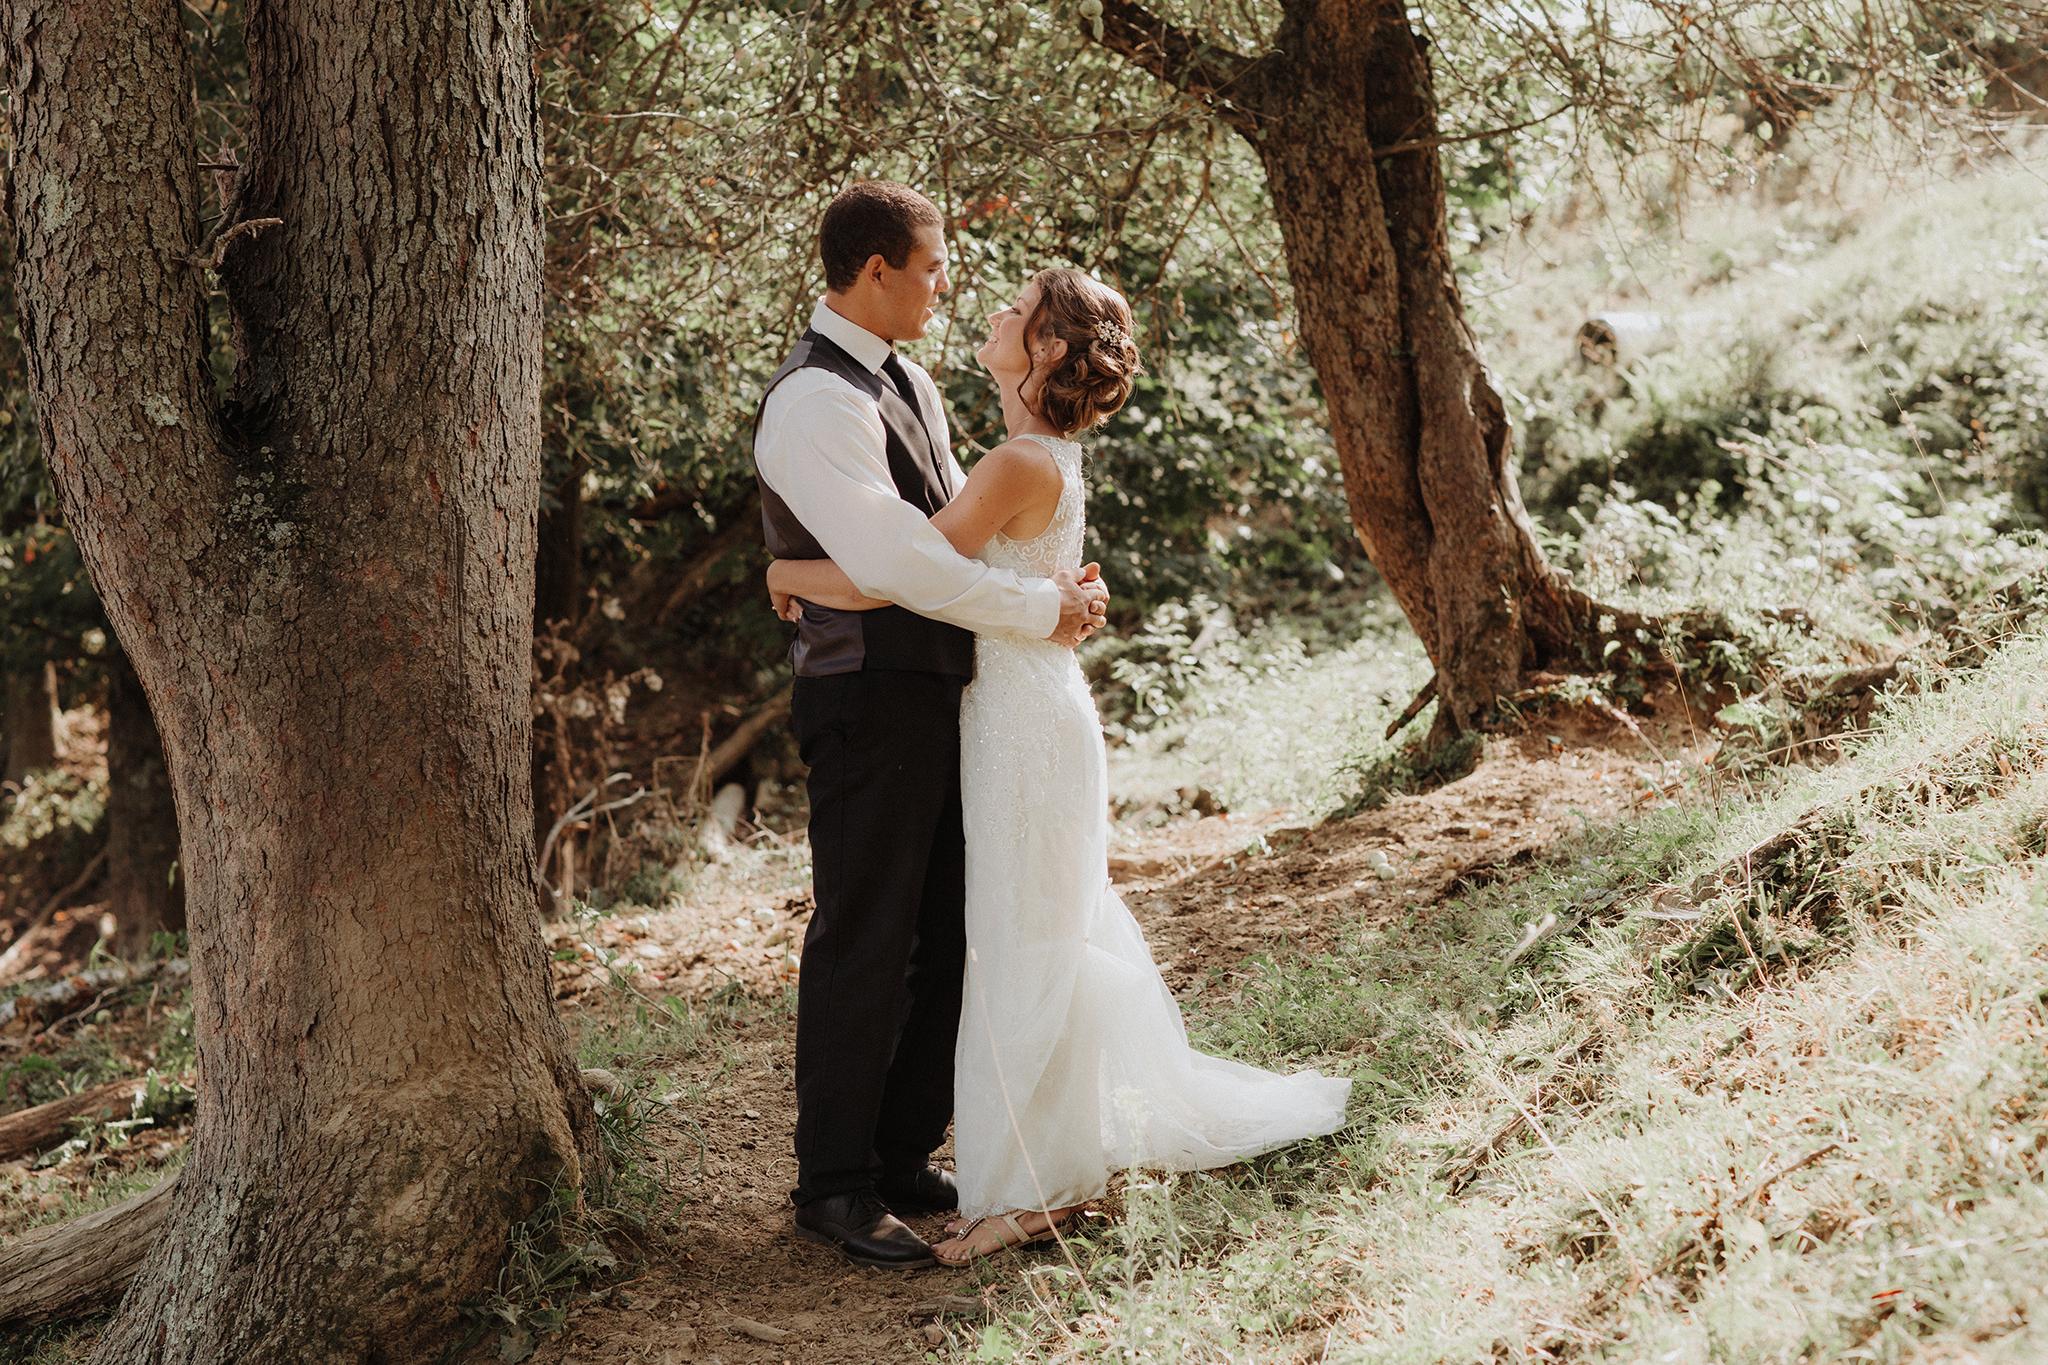 vermont-wedding-photographer-outdoor-farm-wedding-38.jpg